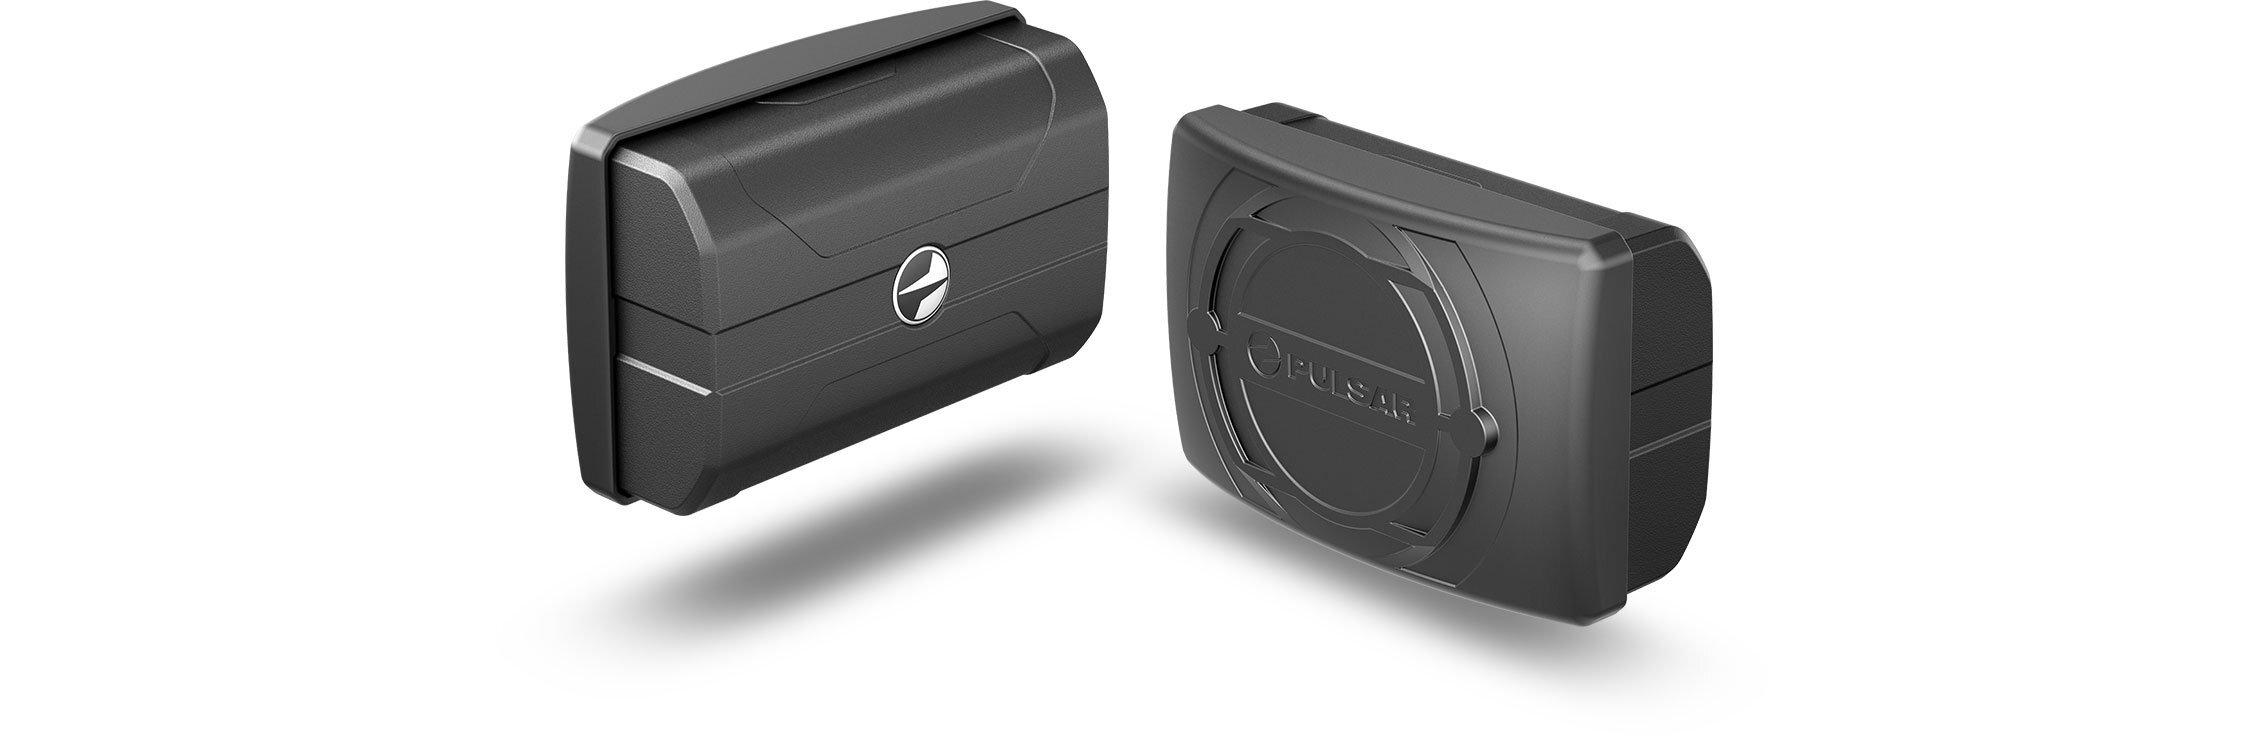 Pulsar Accolade 2 LRF Thermal Binoculars